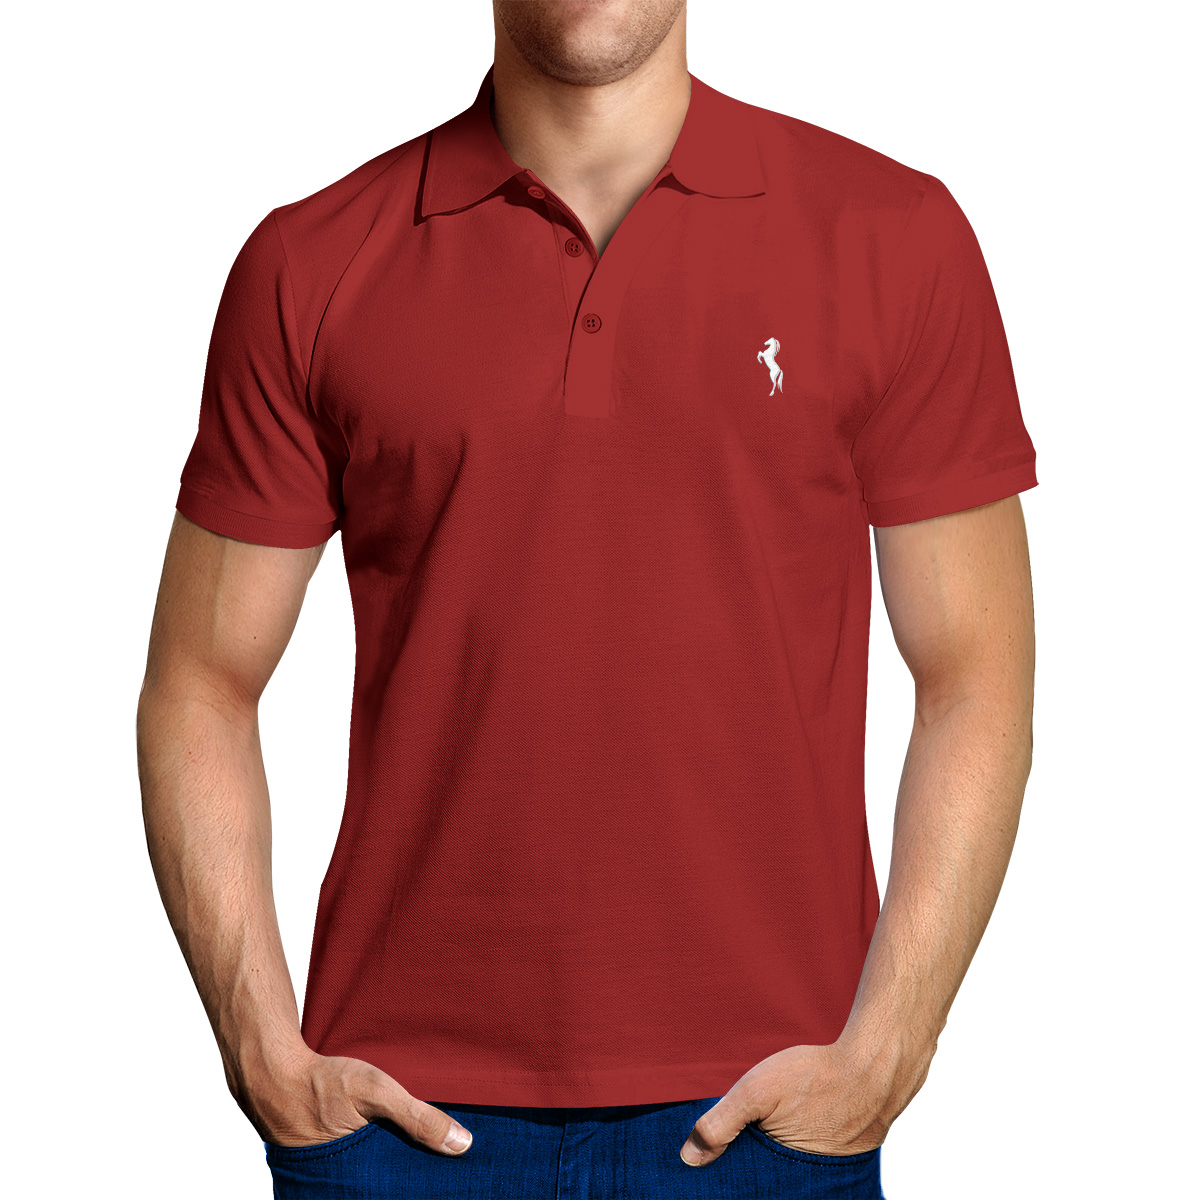 Enharid classic polo shirt for men maroon enharid for Maroon t shirt for men